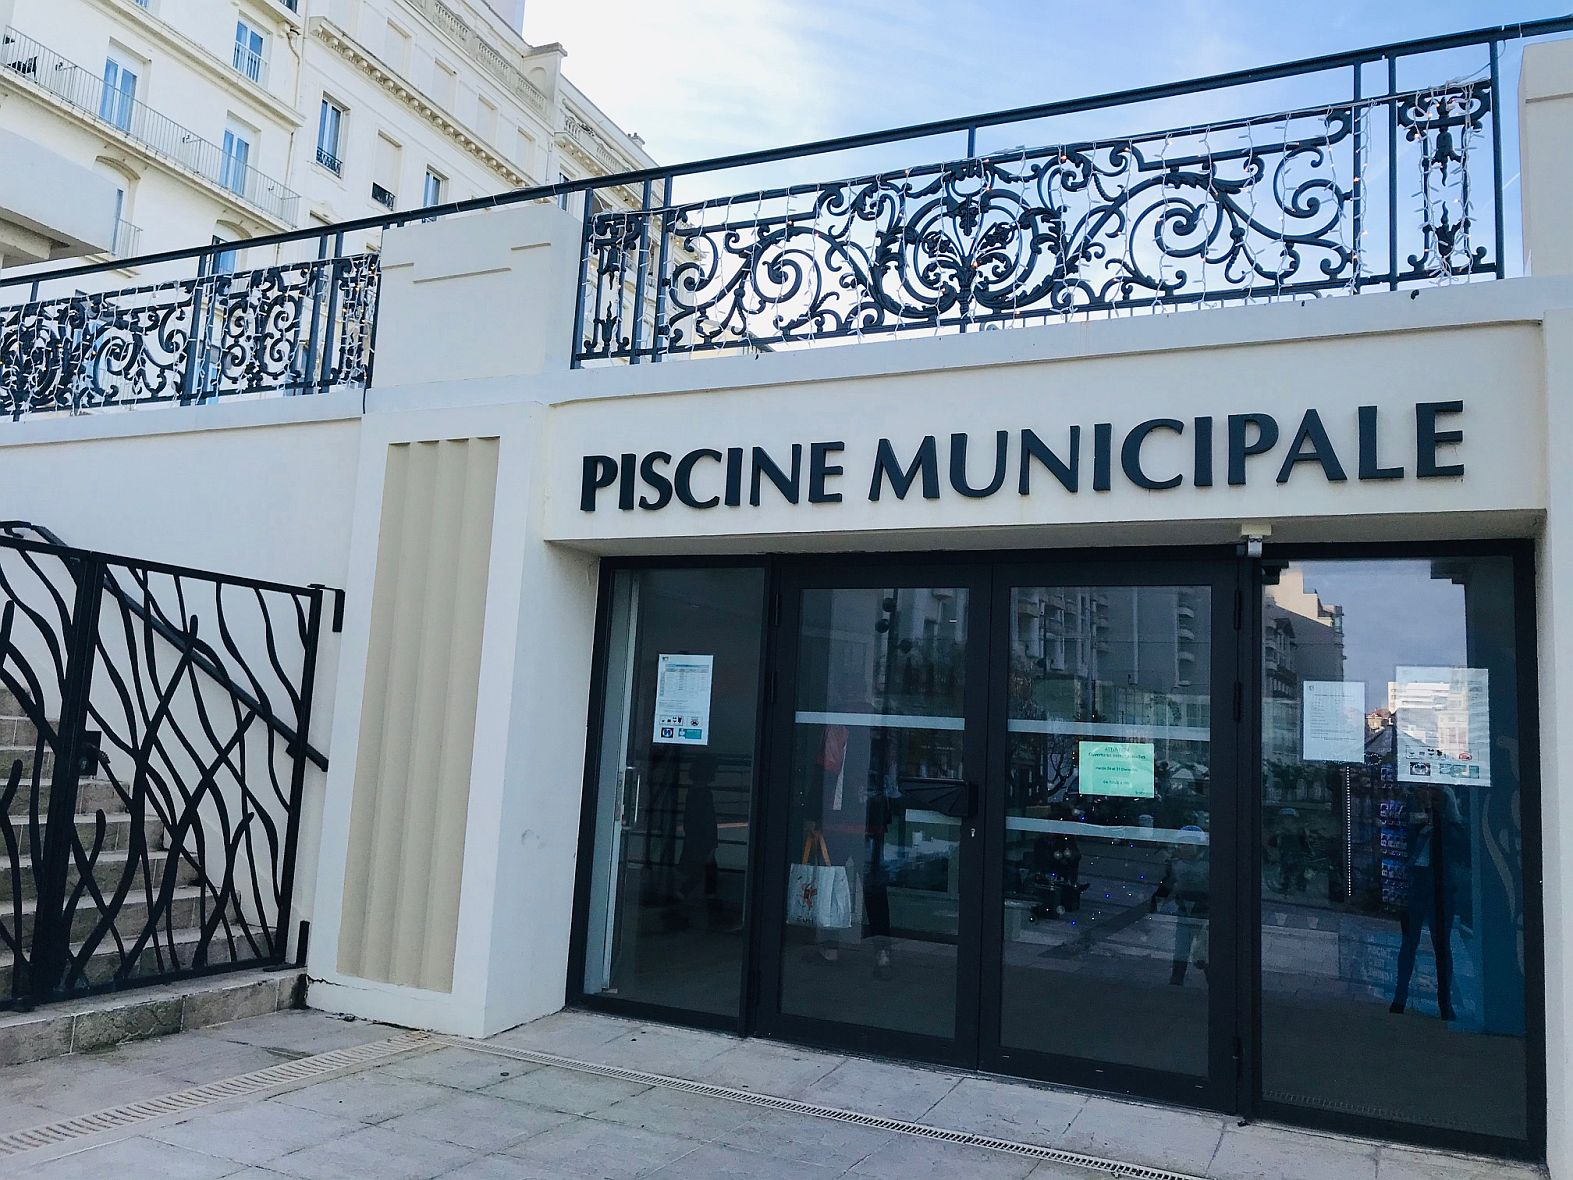 Piscine Municipale De Biarritz | Office De Tourisme Biarritz serapportantà Piscine Municipale Biarritz